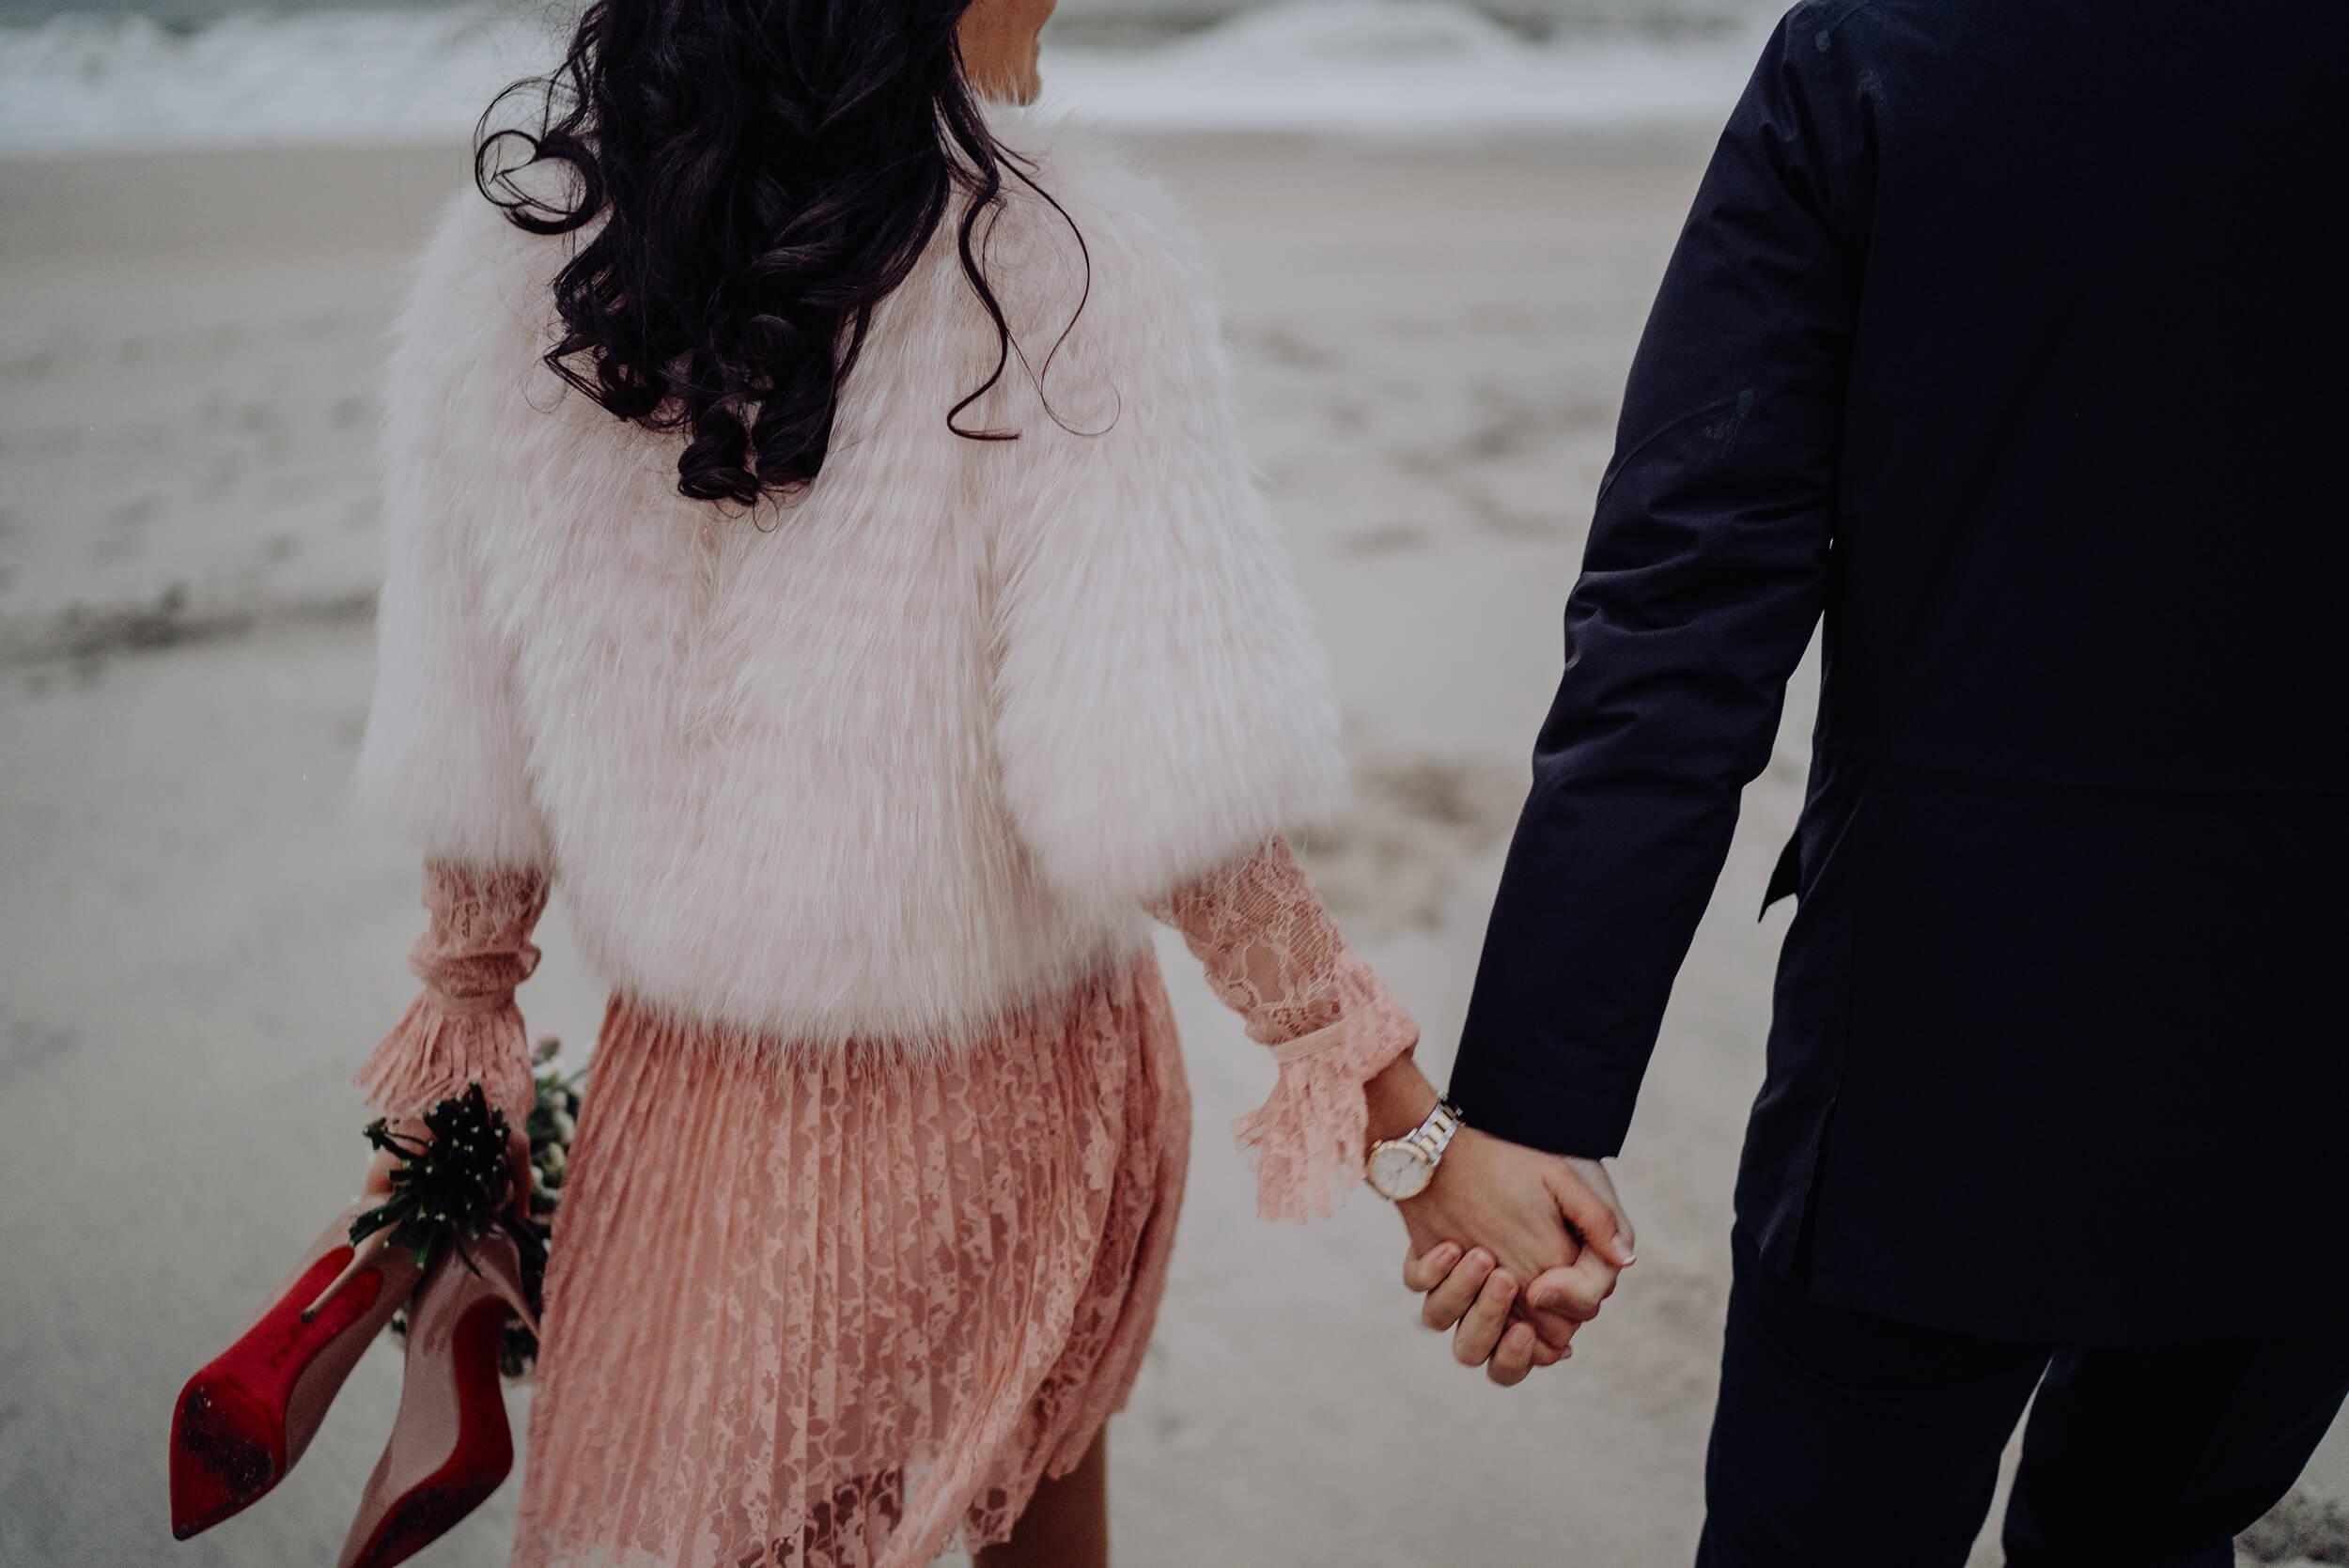 roma-organizacao-eventos-pedido-de-casamento-no-porto-49